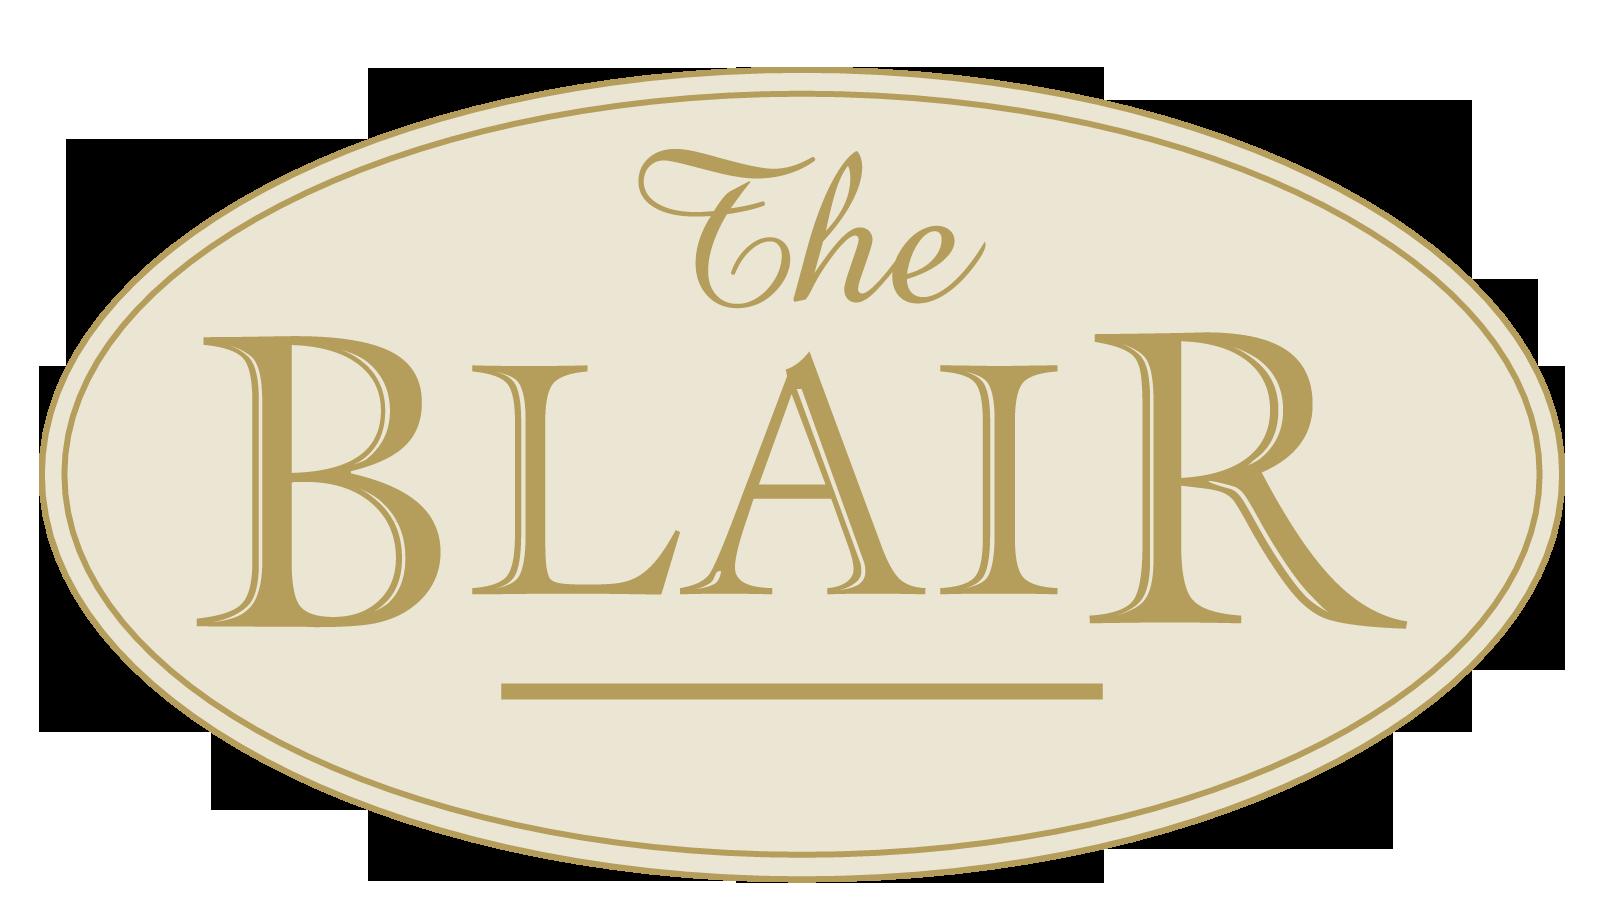 The Blair